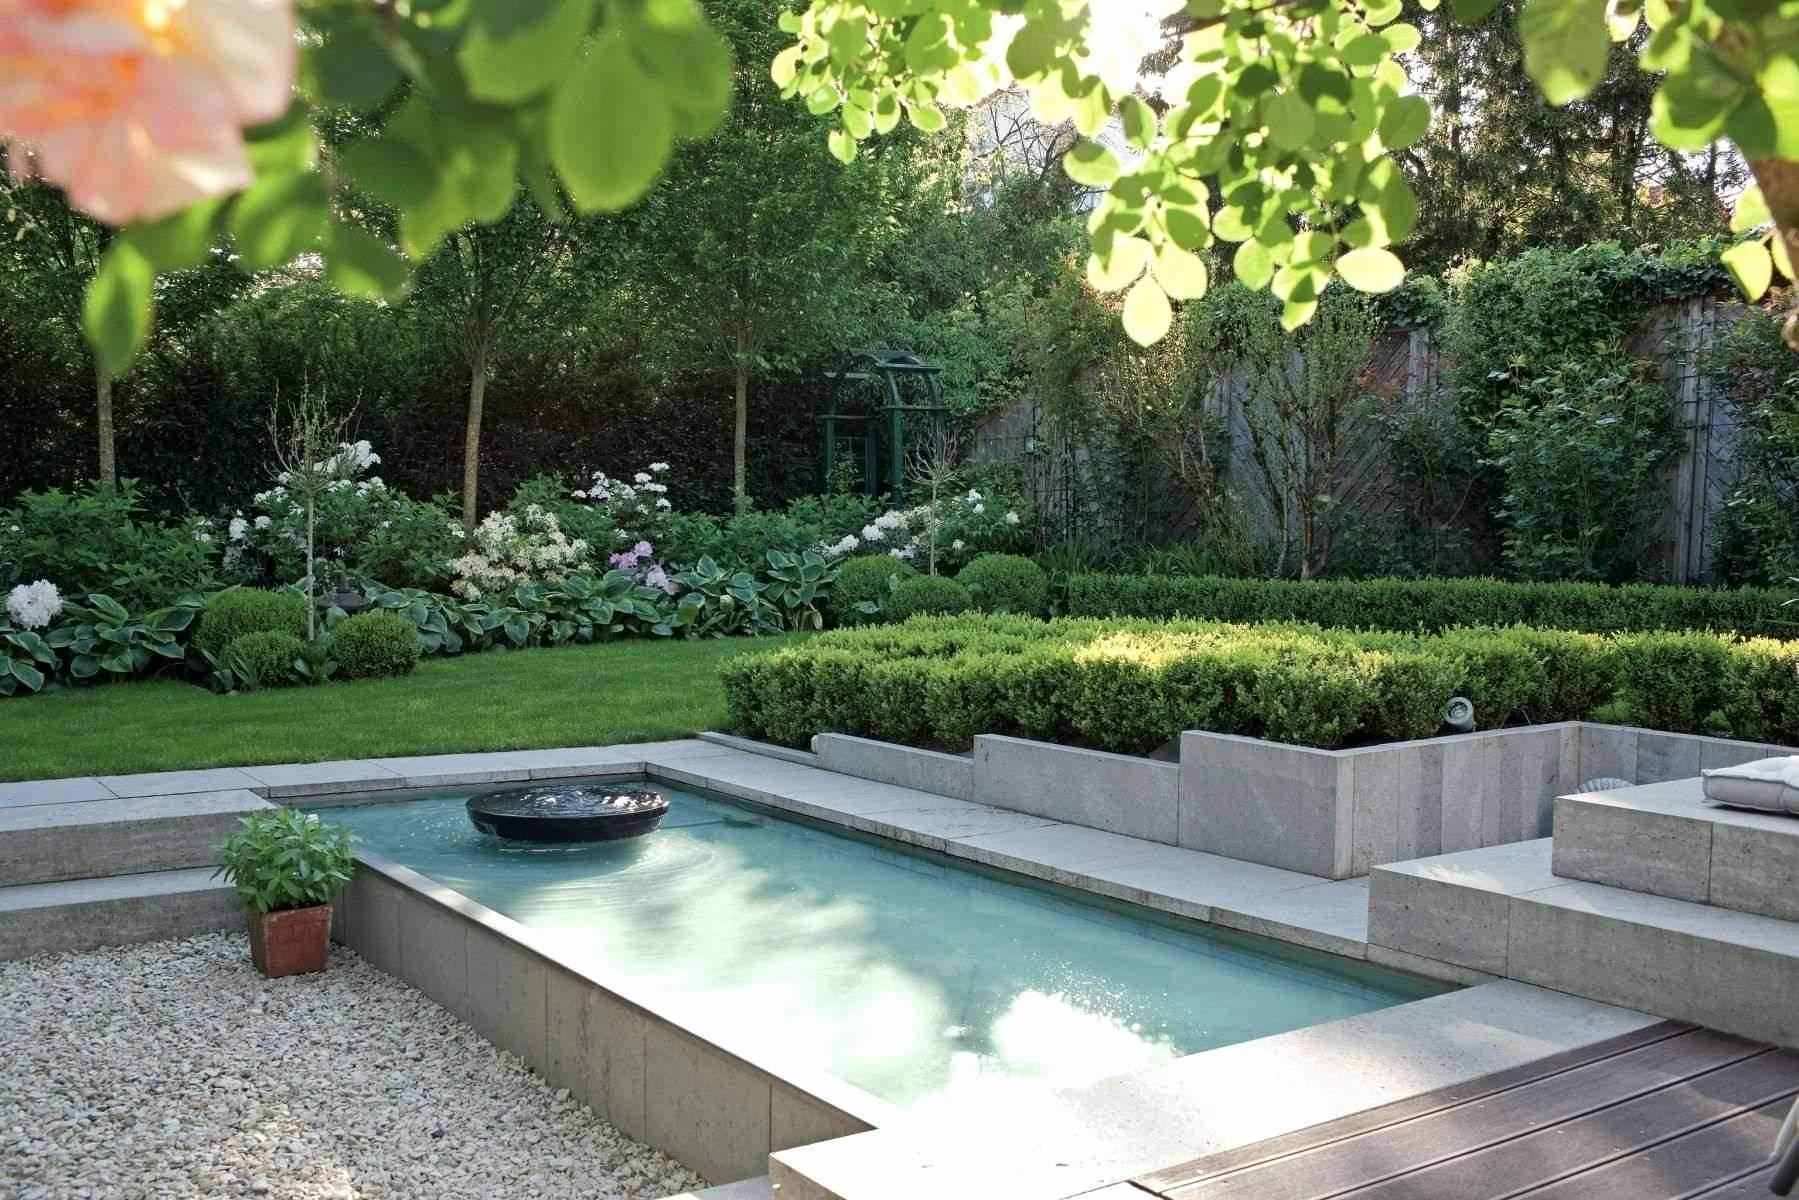 Gartengestaltung Pavillon Ideen Schön 31 Inspirierend Garten Beispiele Reizend